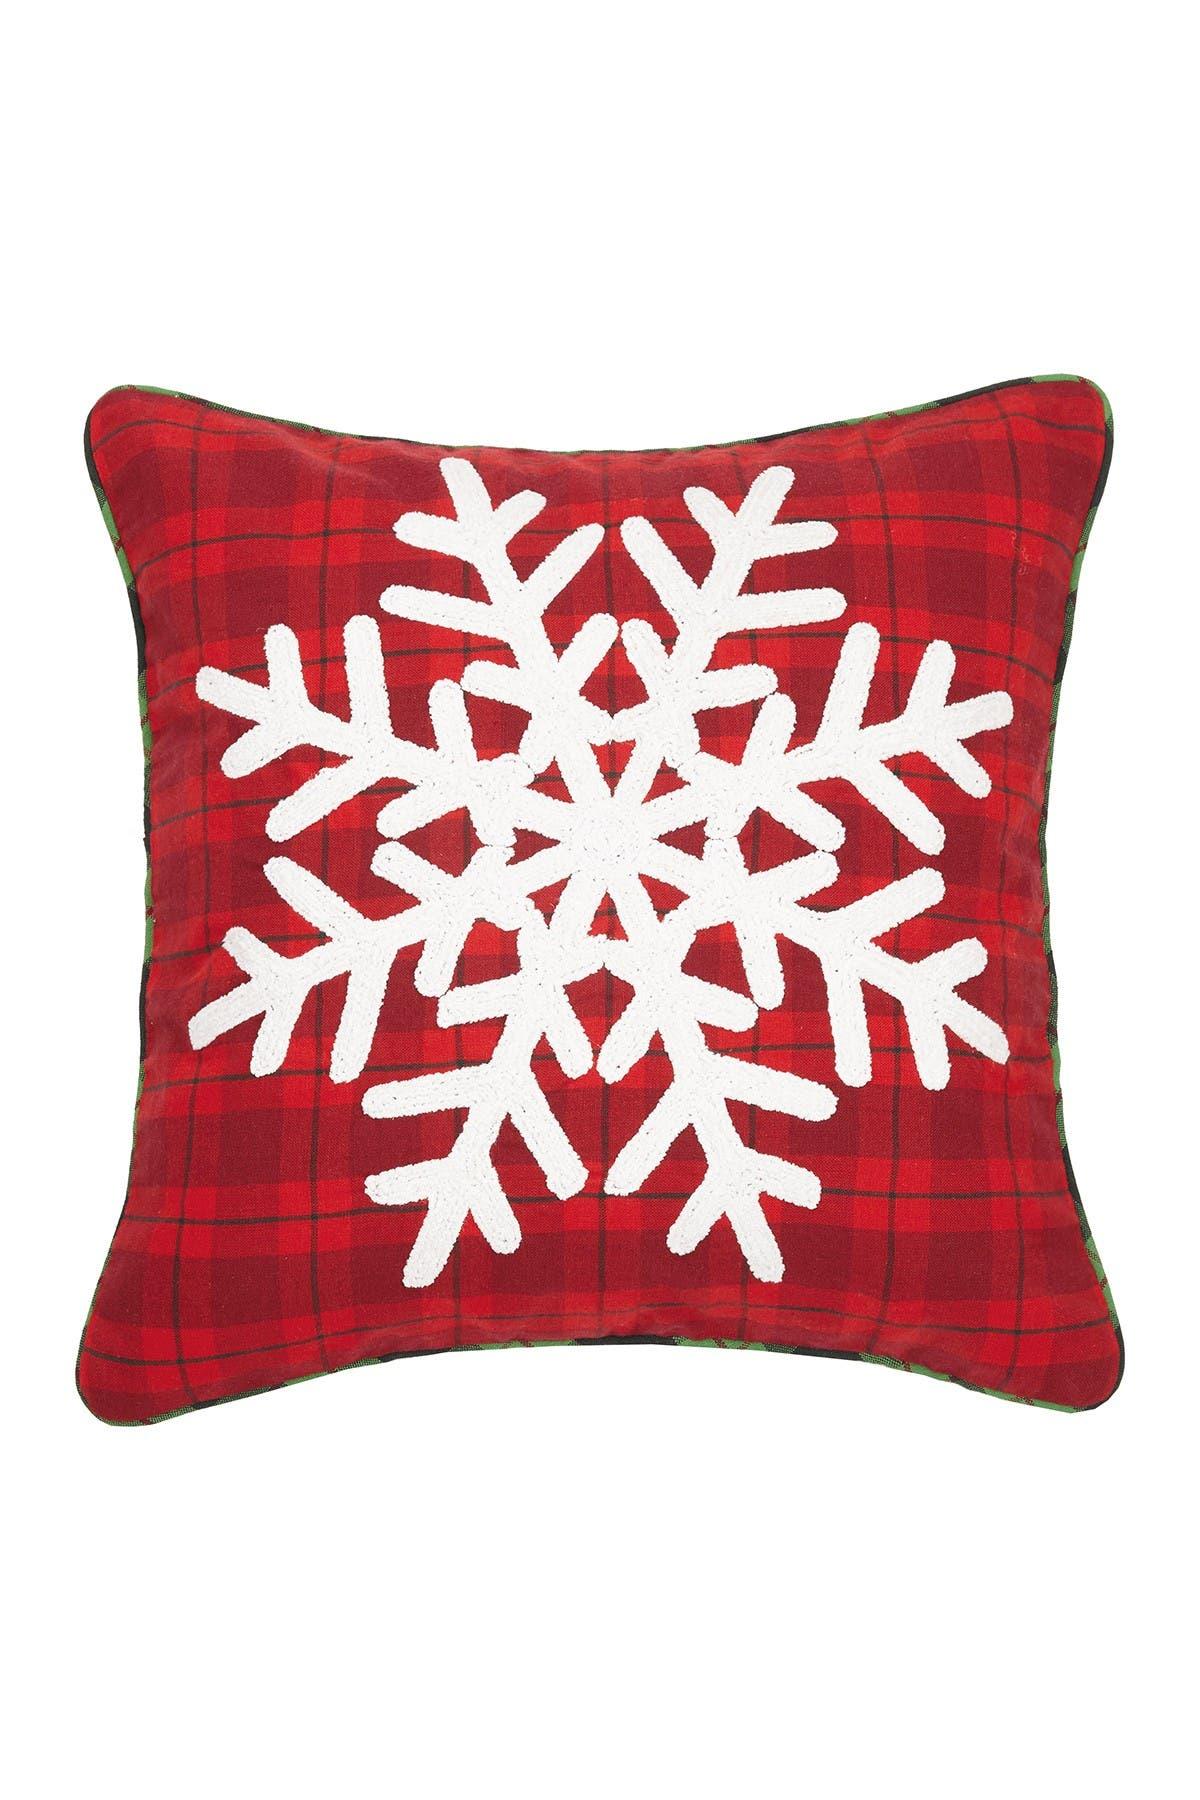 Image of Peking Handicraft Red/White Plaid Snowflake Chenille Pillow